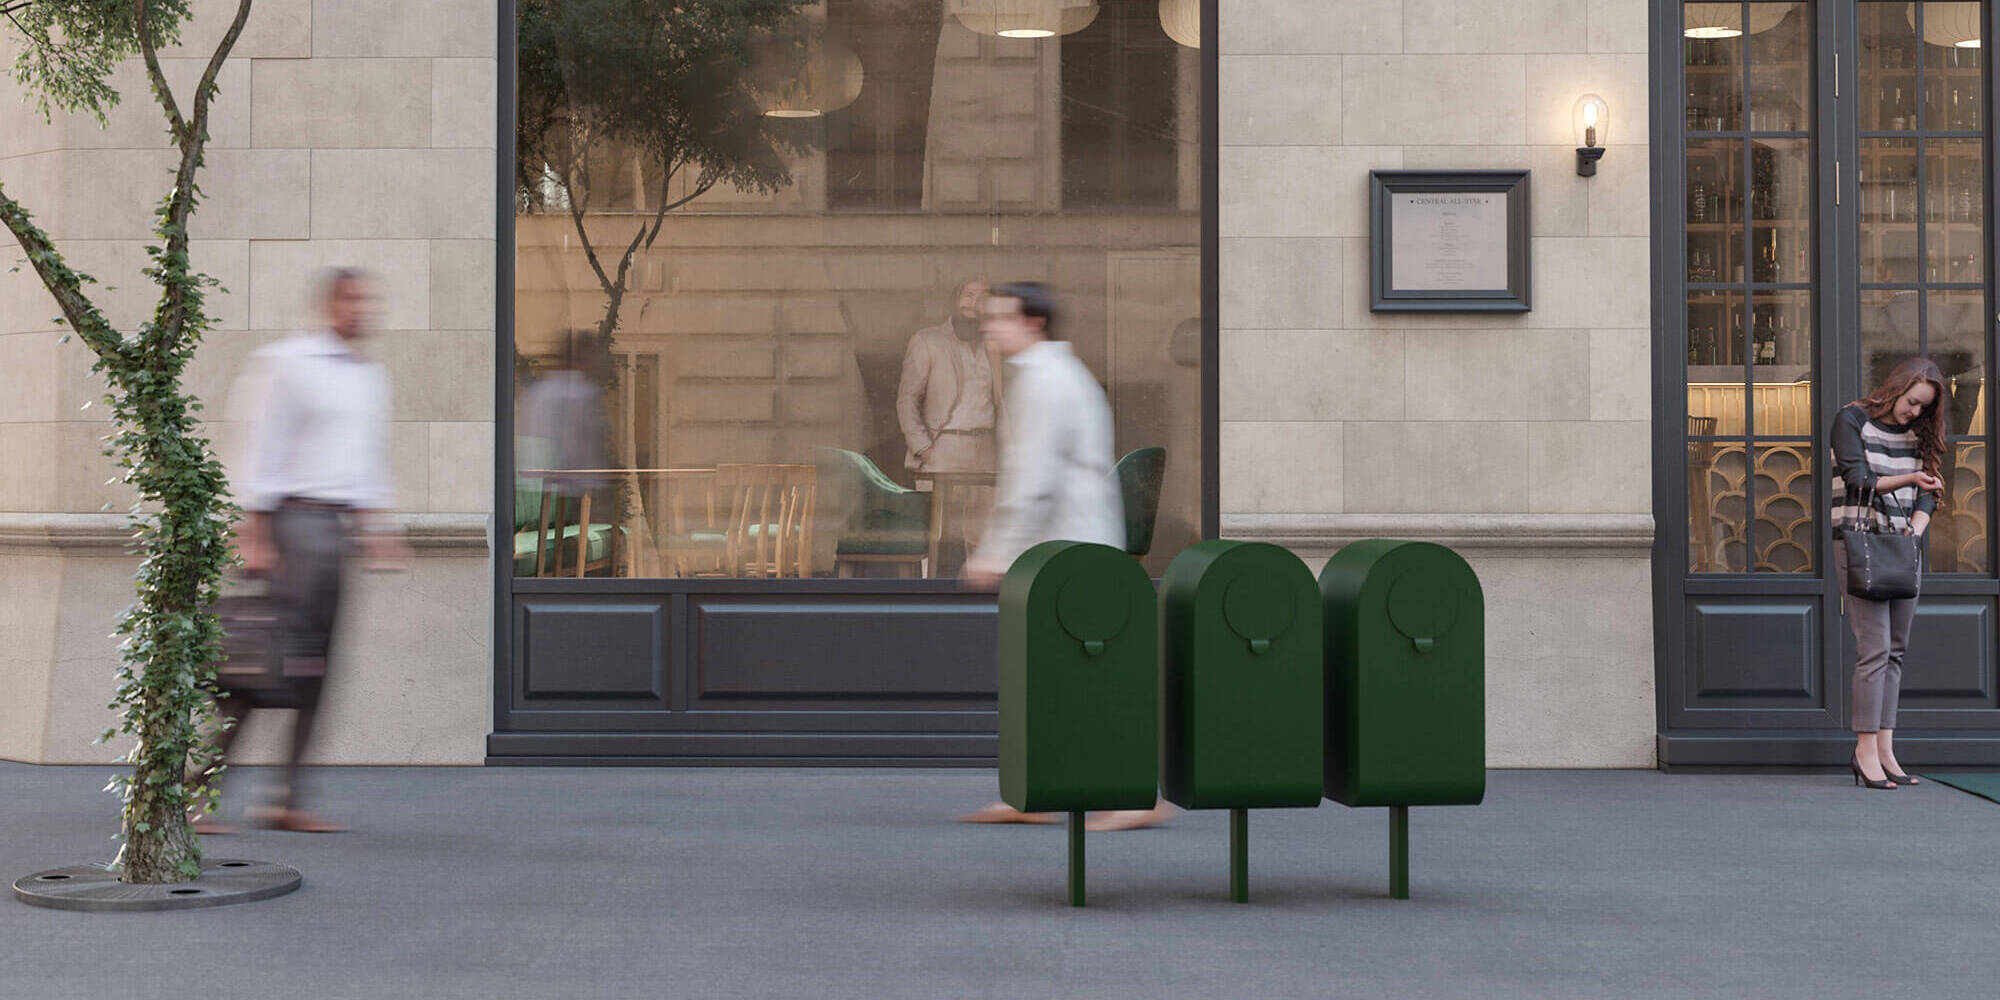 popsicle papperskorg utomhus offentliga miljöer källsortering trece jangir maddadi